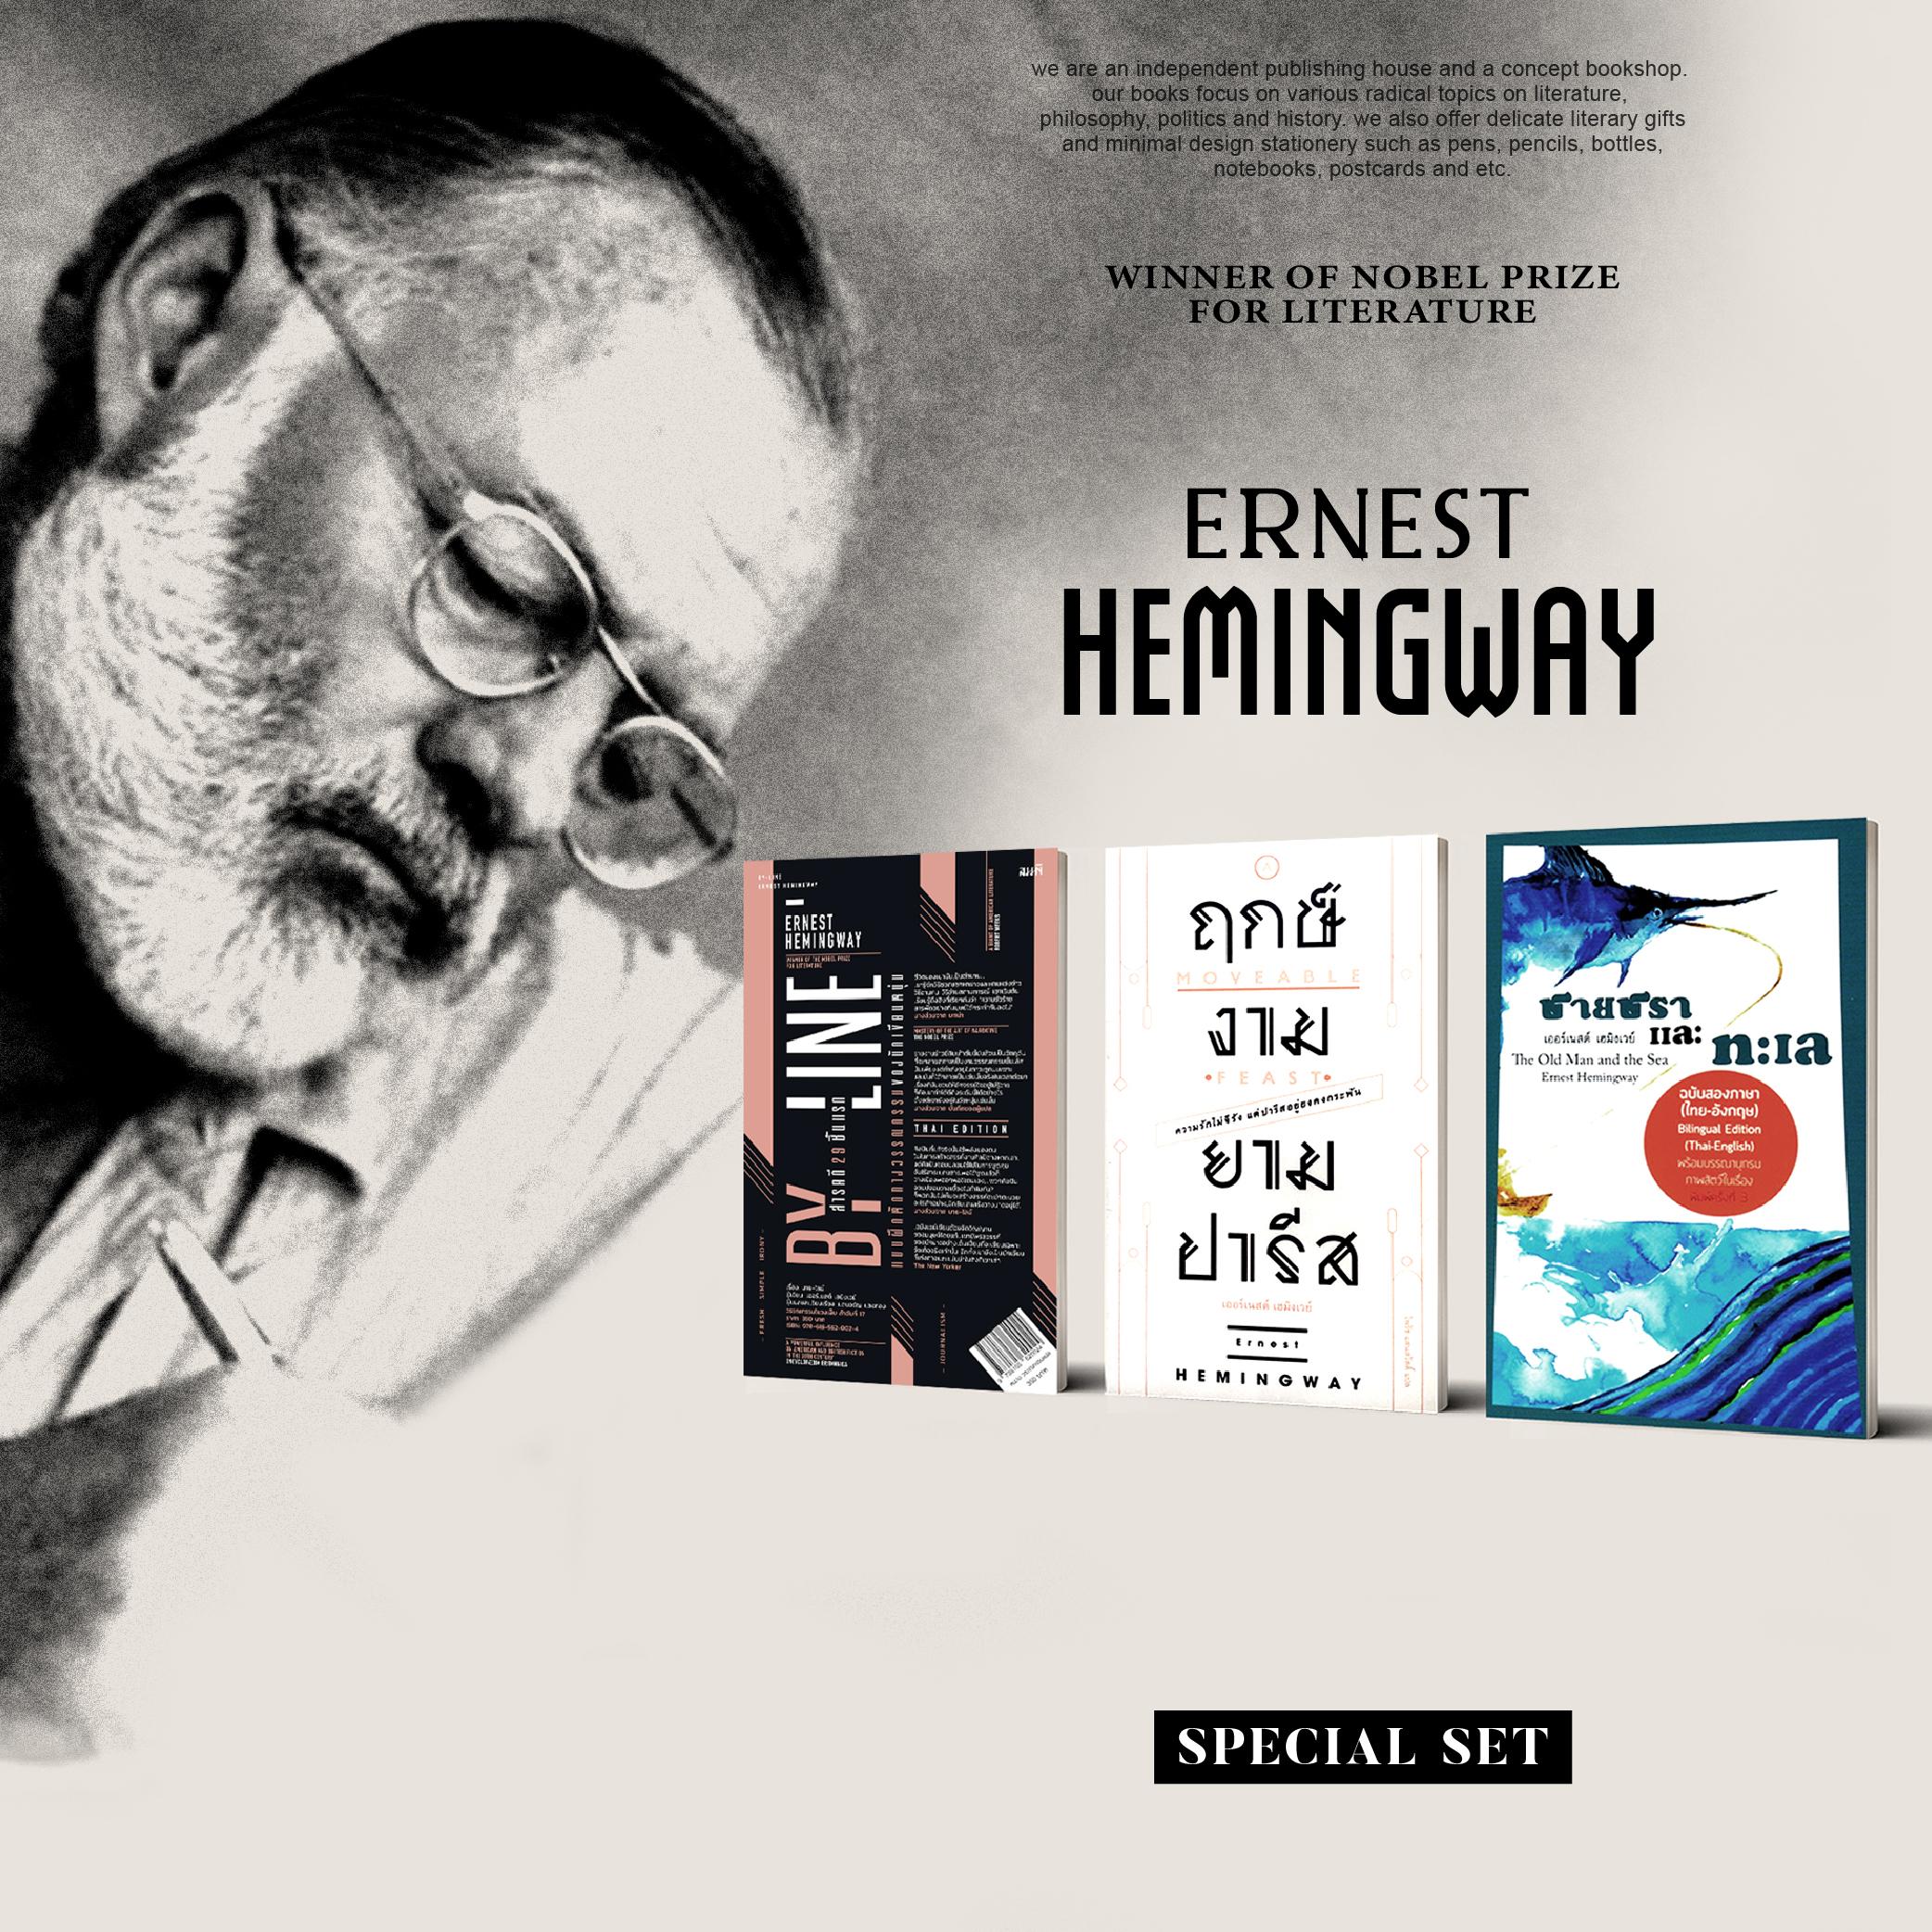 Set เออร์เนสต์ เฮมิงเวย์ (Ernest Hemingway) นักเขียนโนเบล